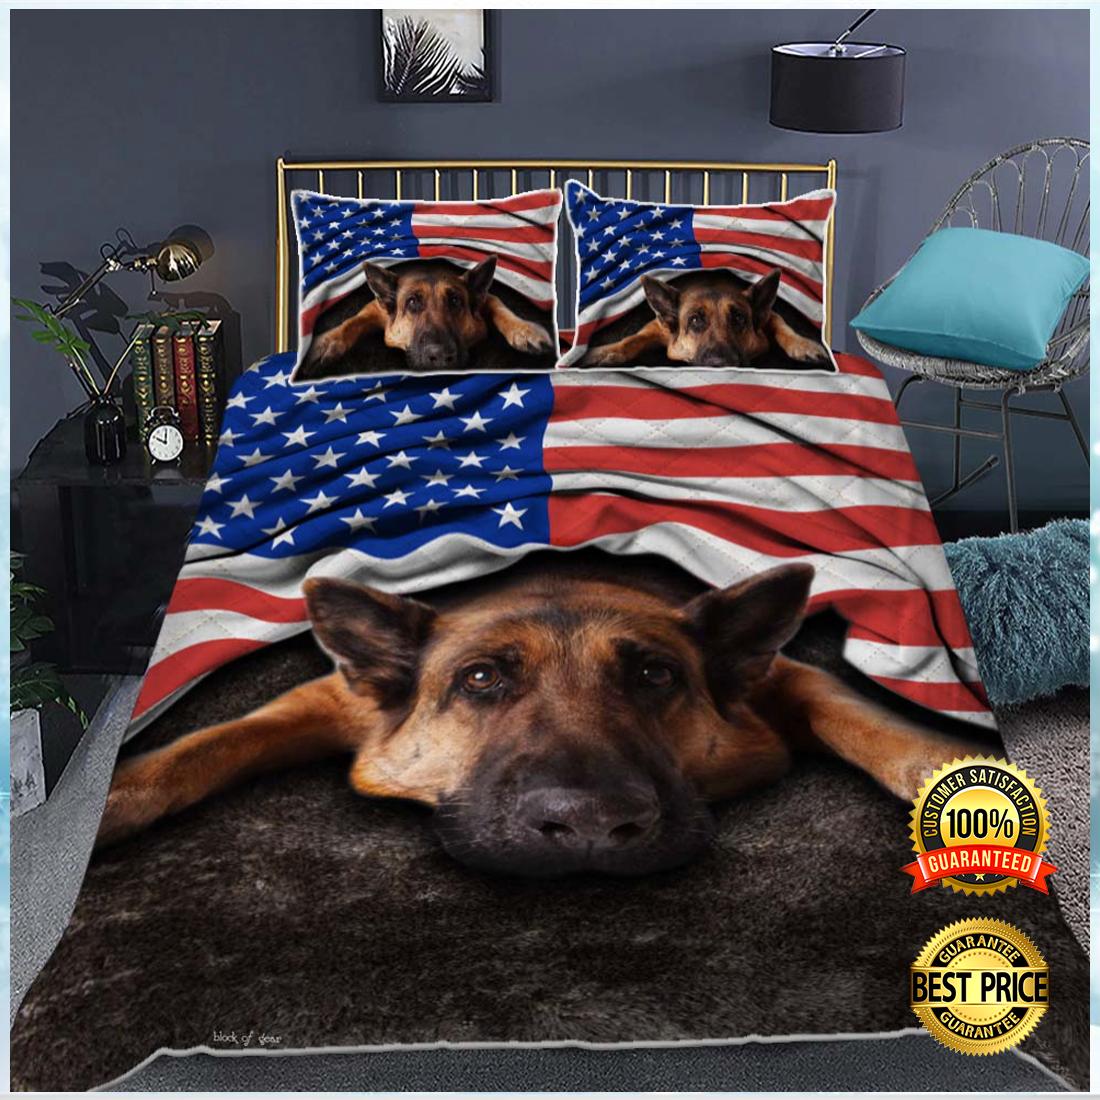 German Shepherd American flag bedding set 4